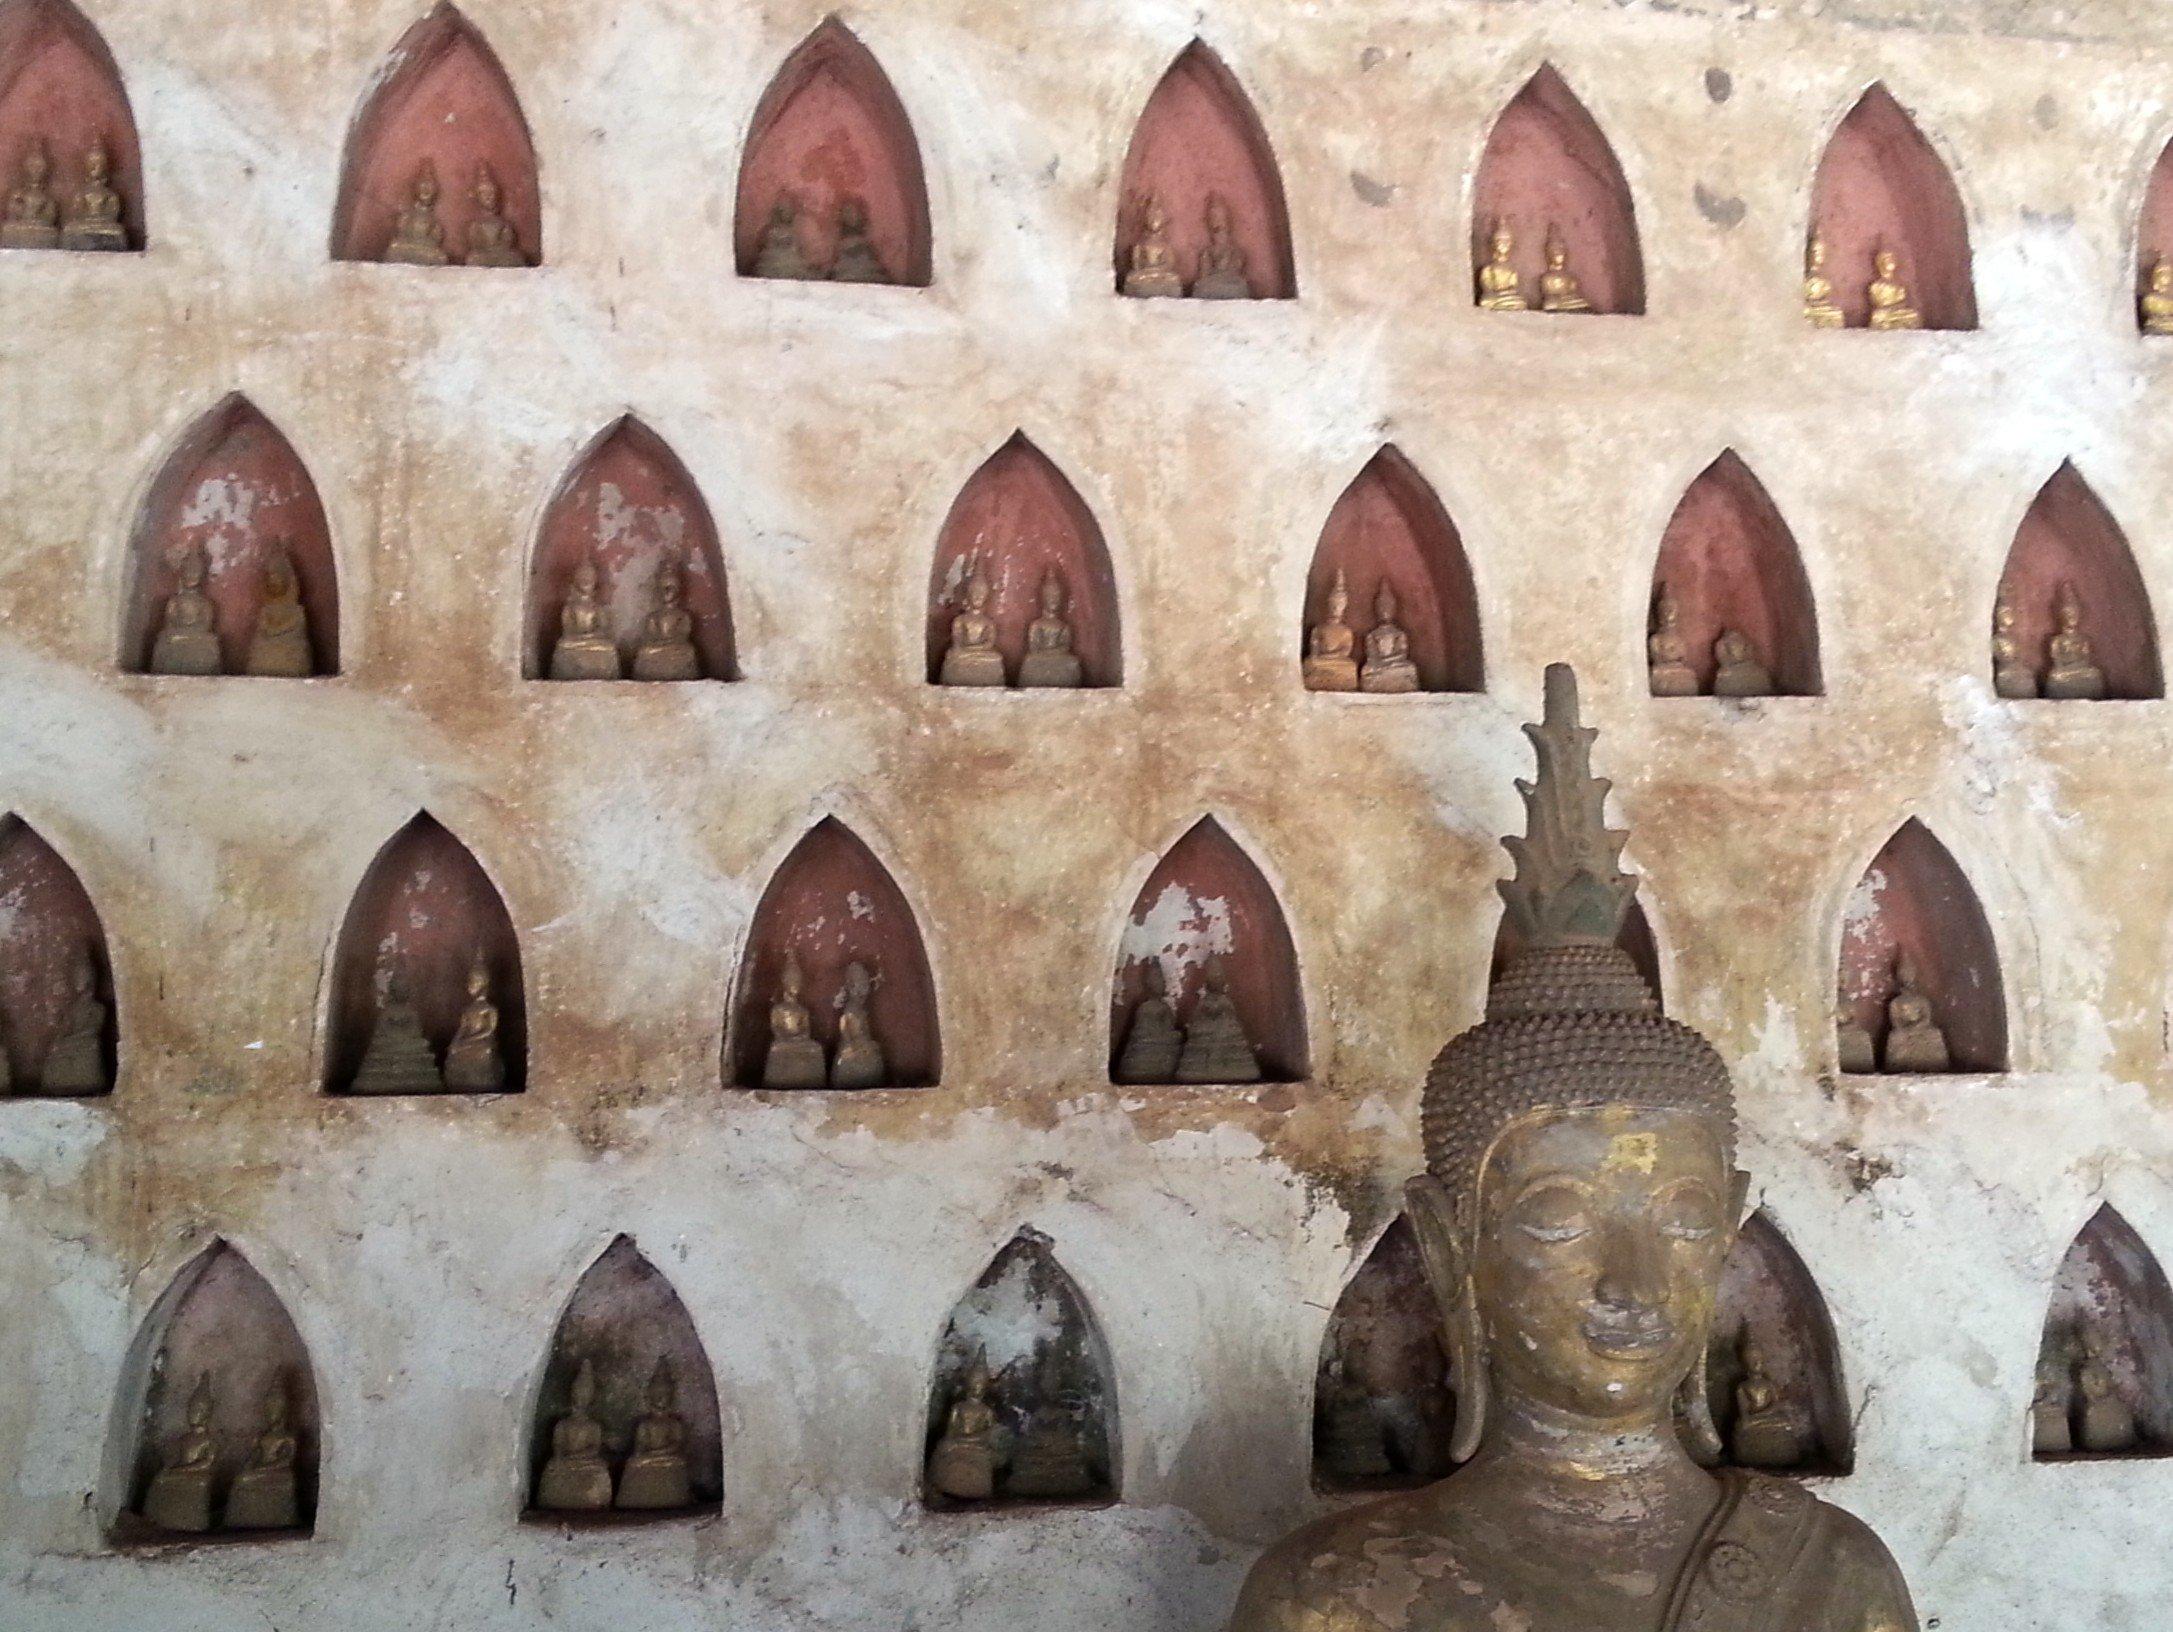 Buddha statues in niches at Wat Si Sa Ket